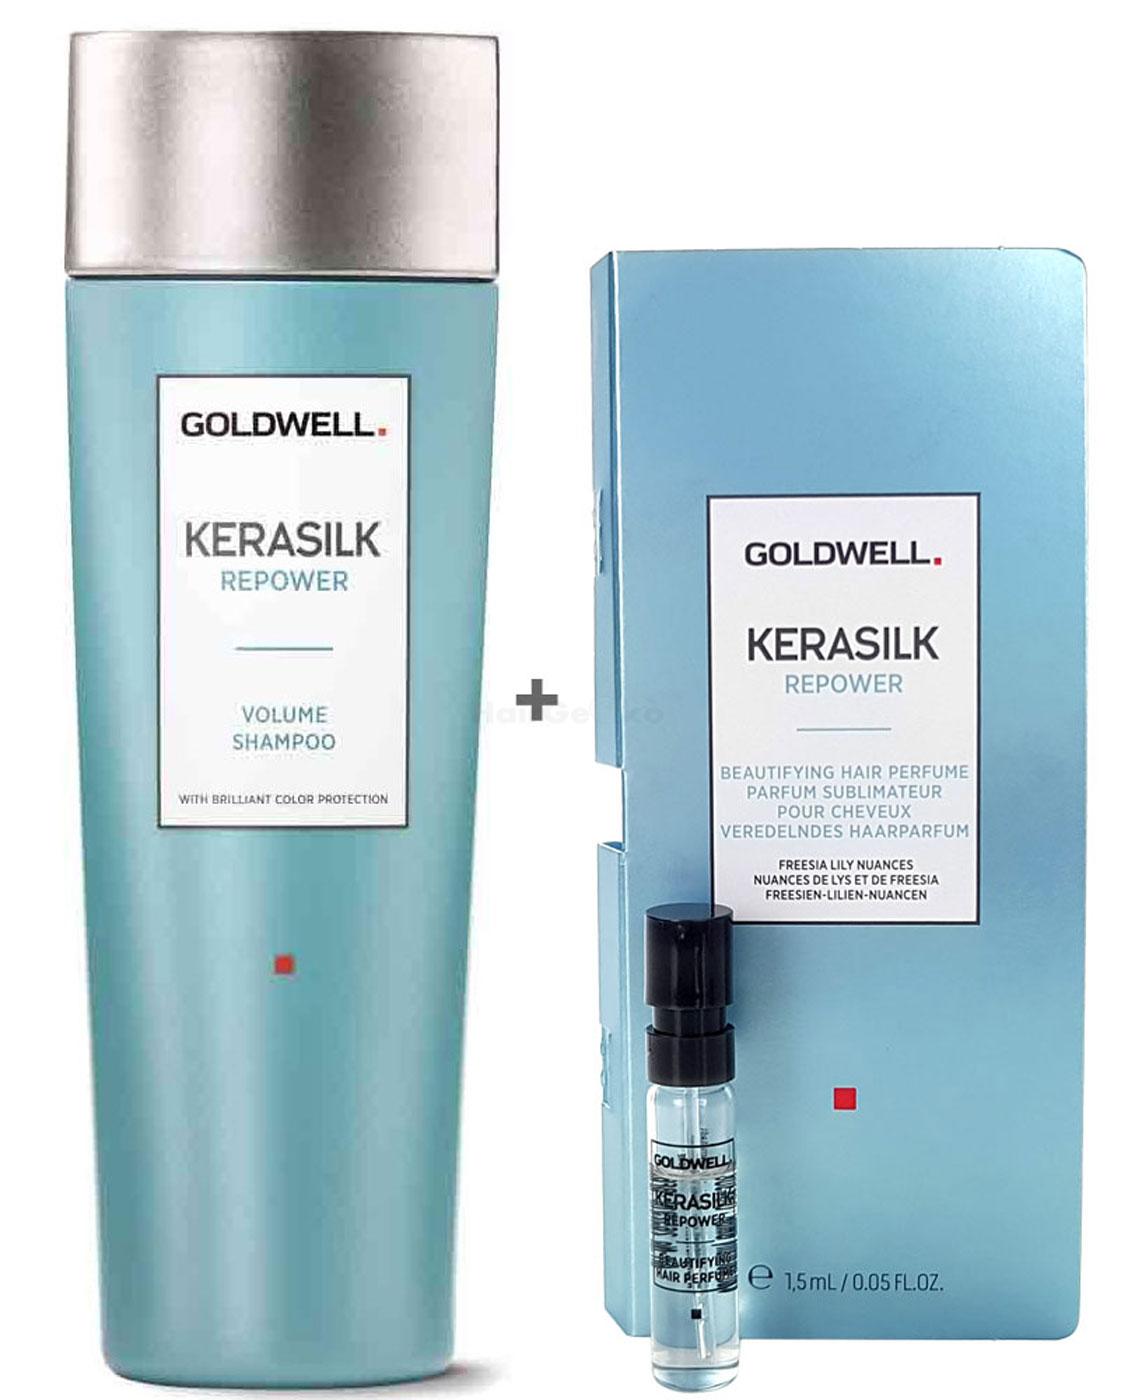 Goldwell Kerasilk Repower Set - Volume Shampoo 250ml + Haarparfum Probe 1,5ml